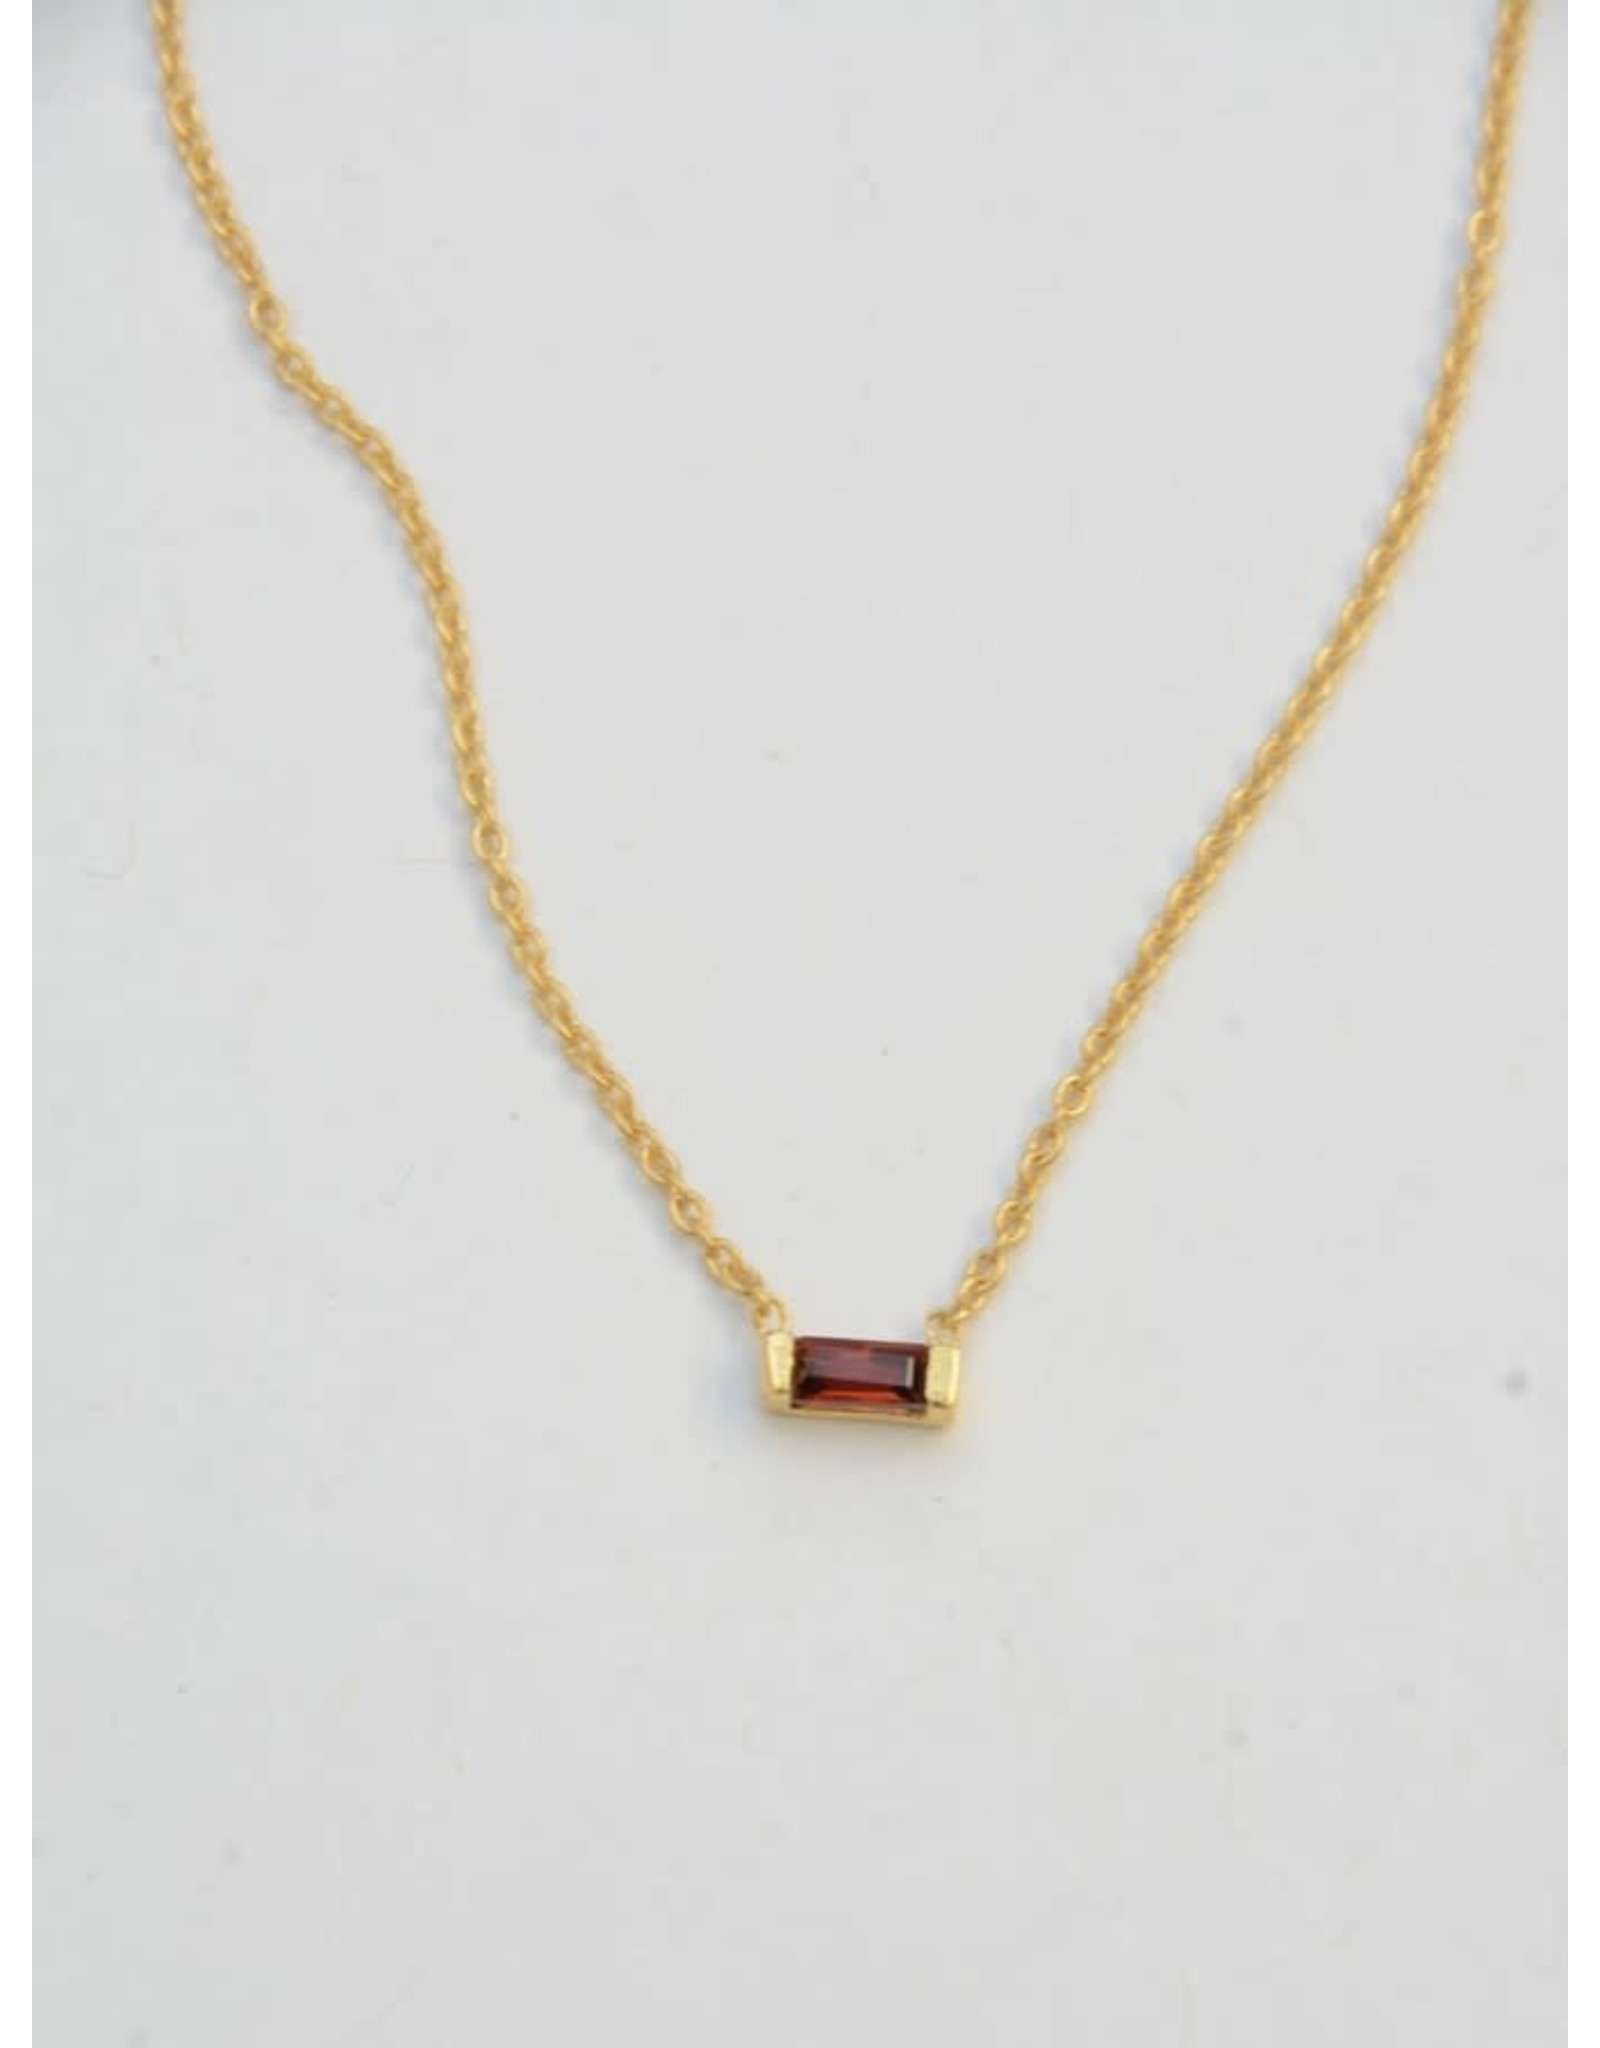 Prism Brass Necklace - Garnet, India